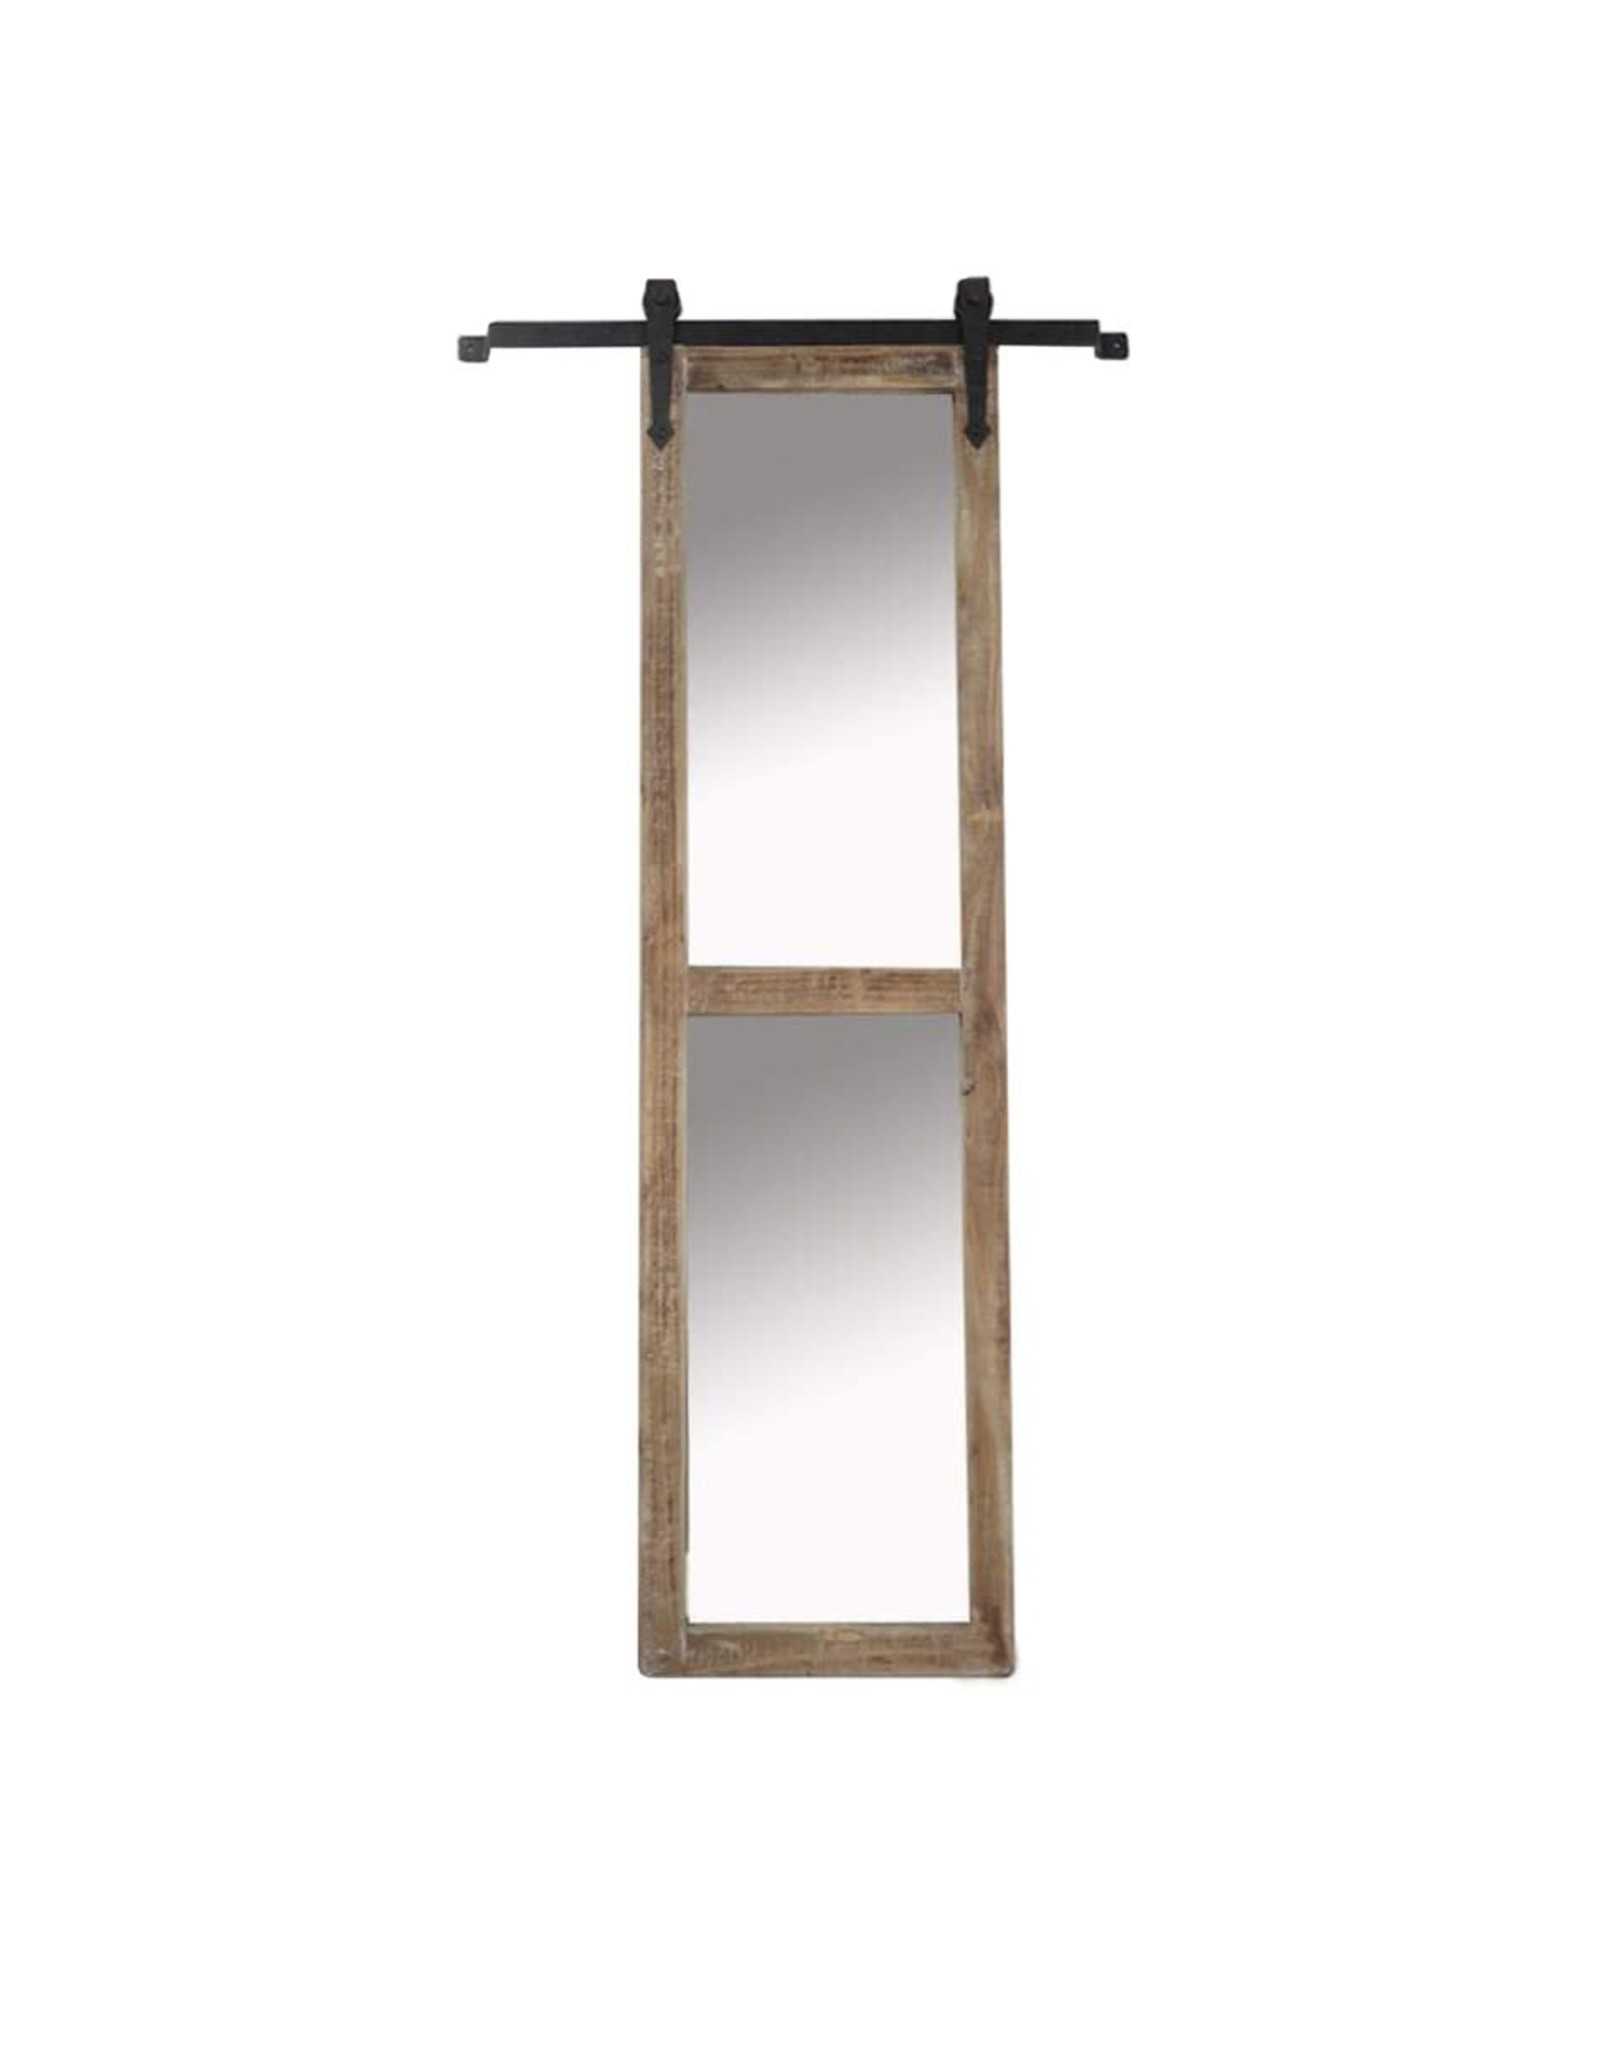 Miroir mural bois antique